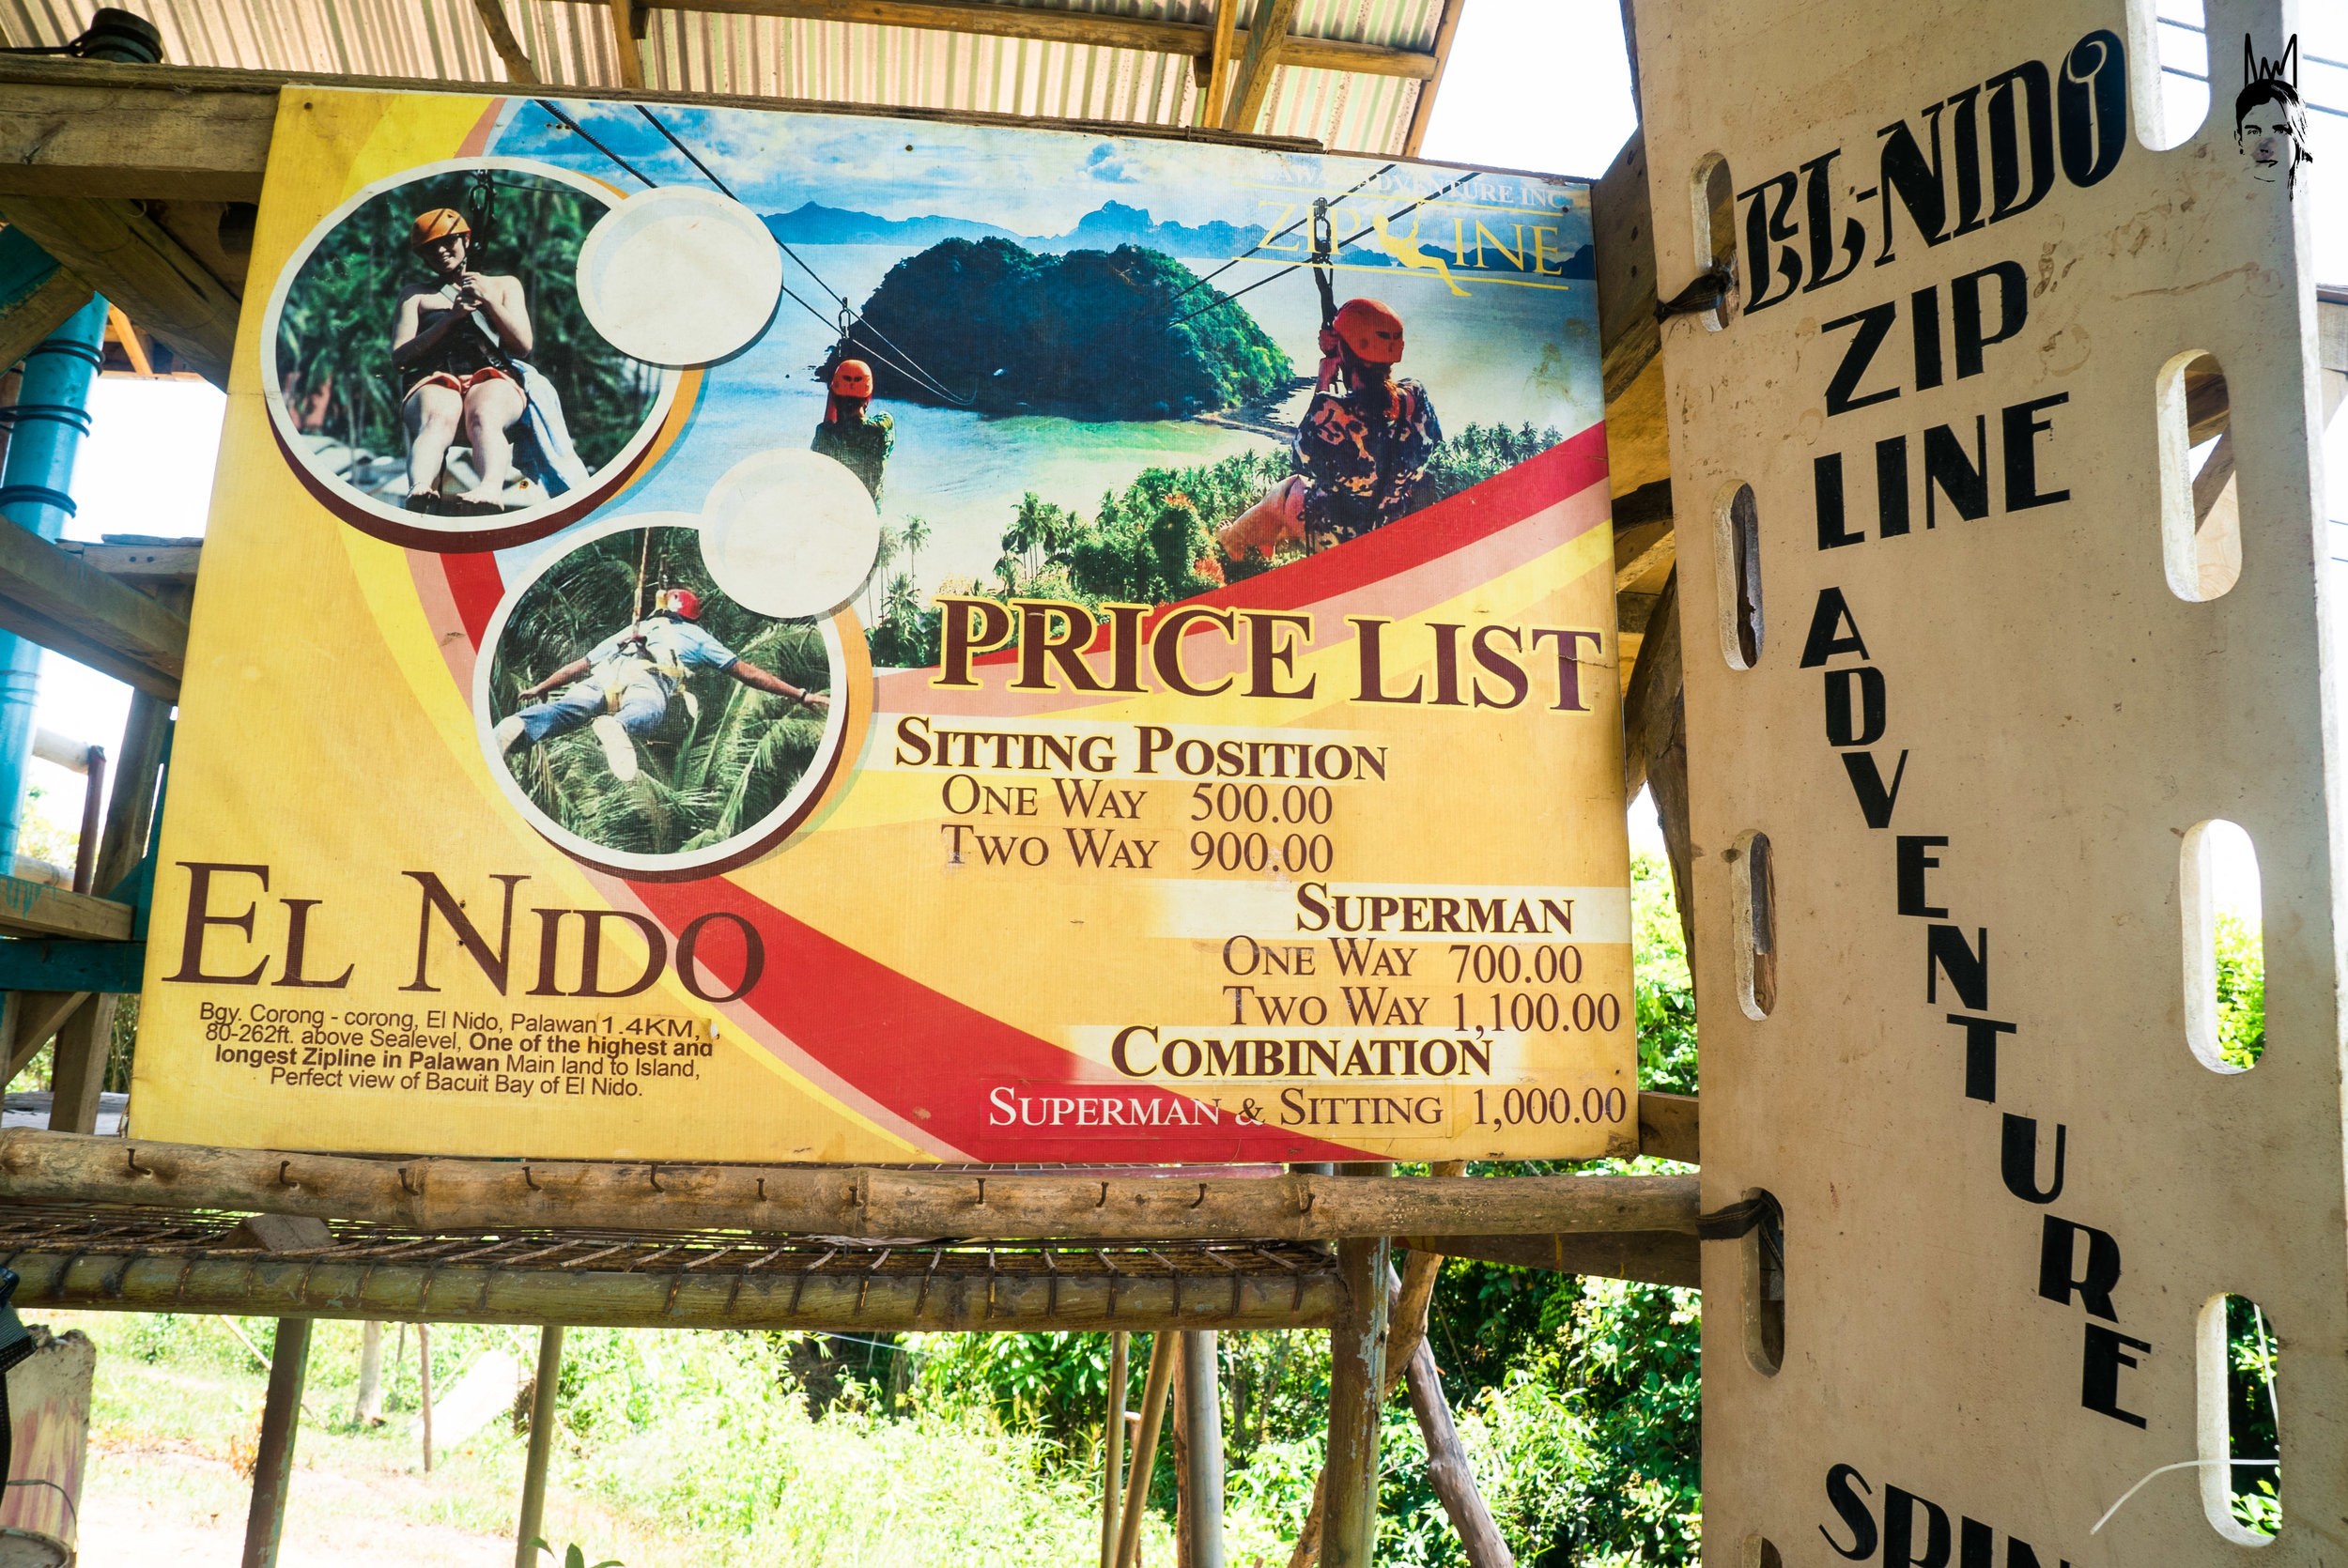 Zip Line Price List